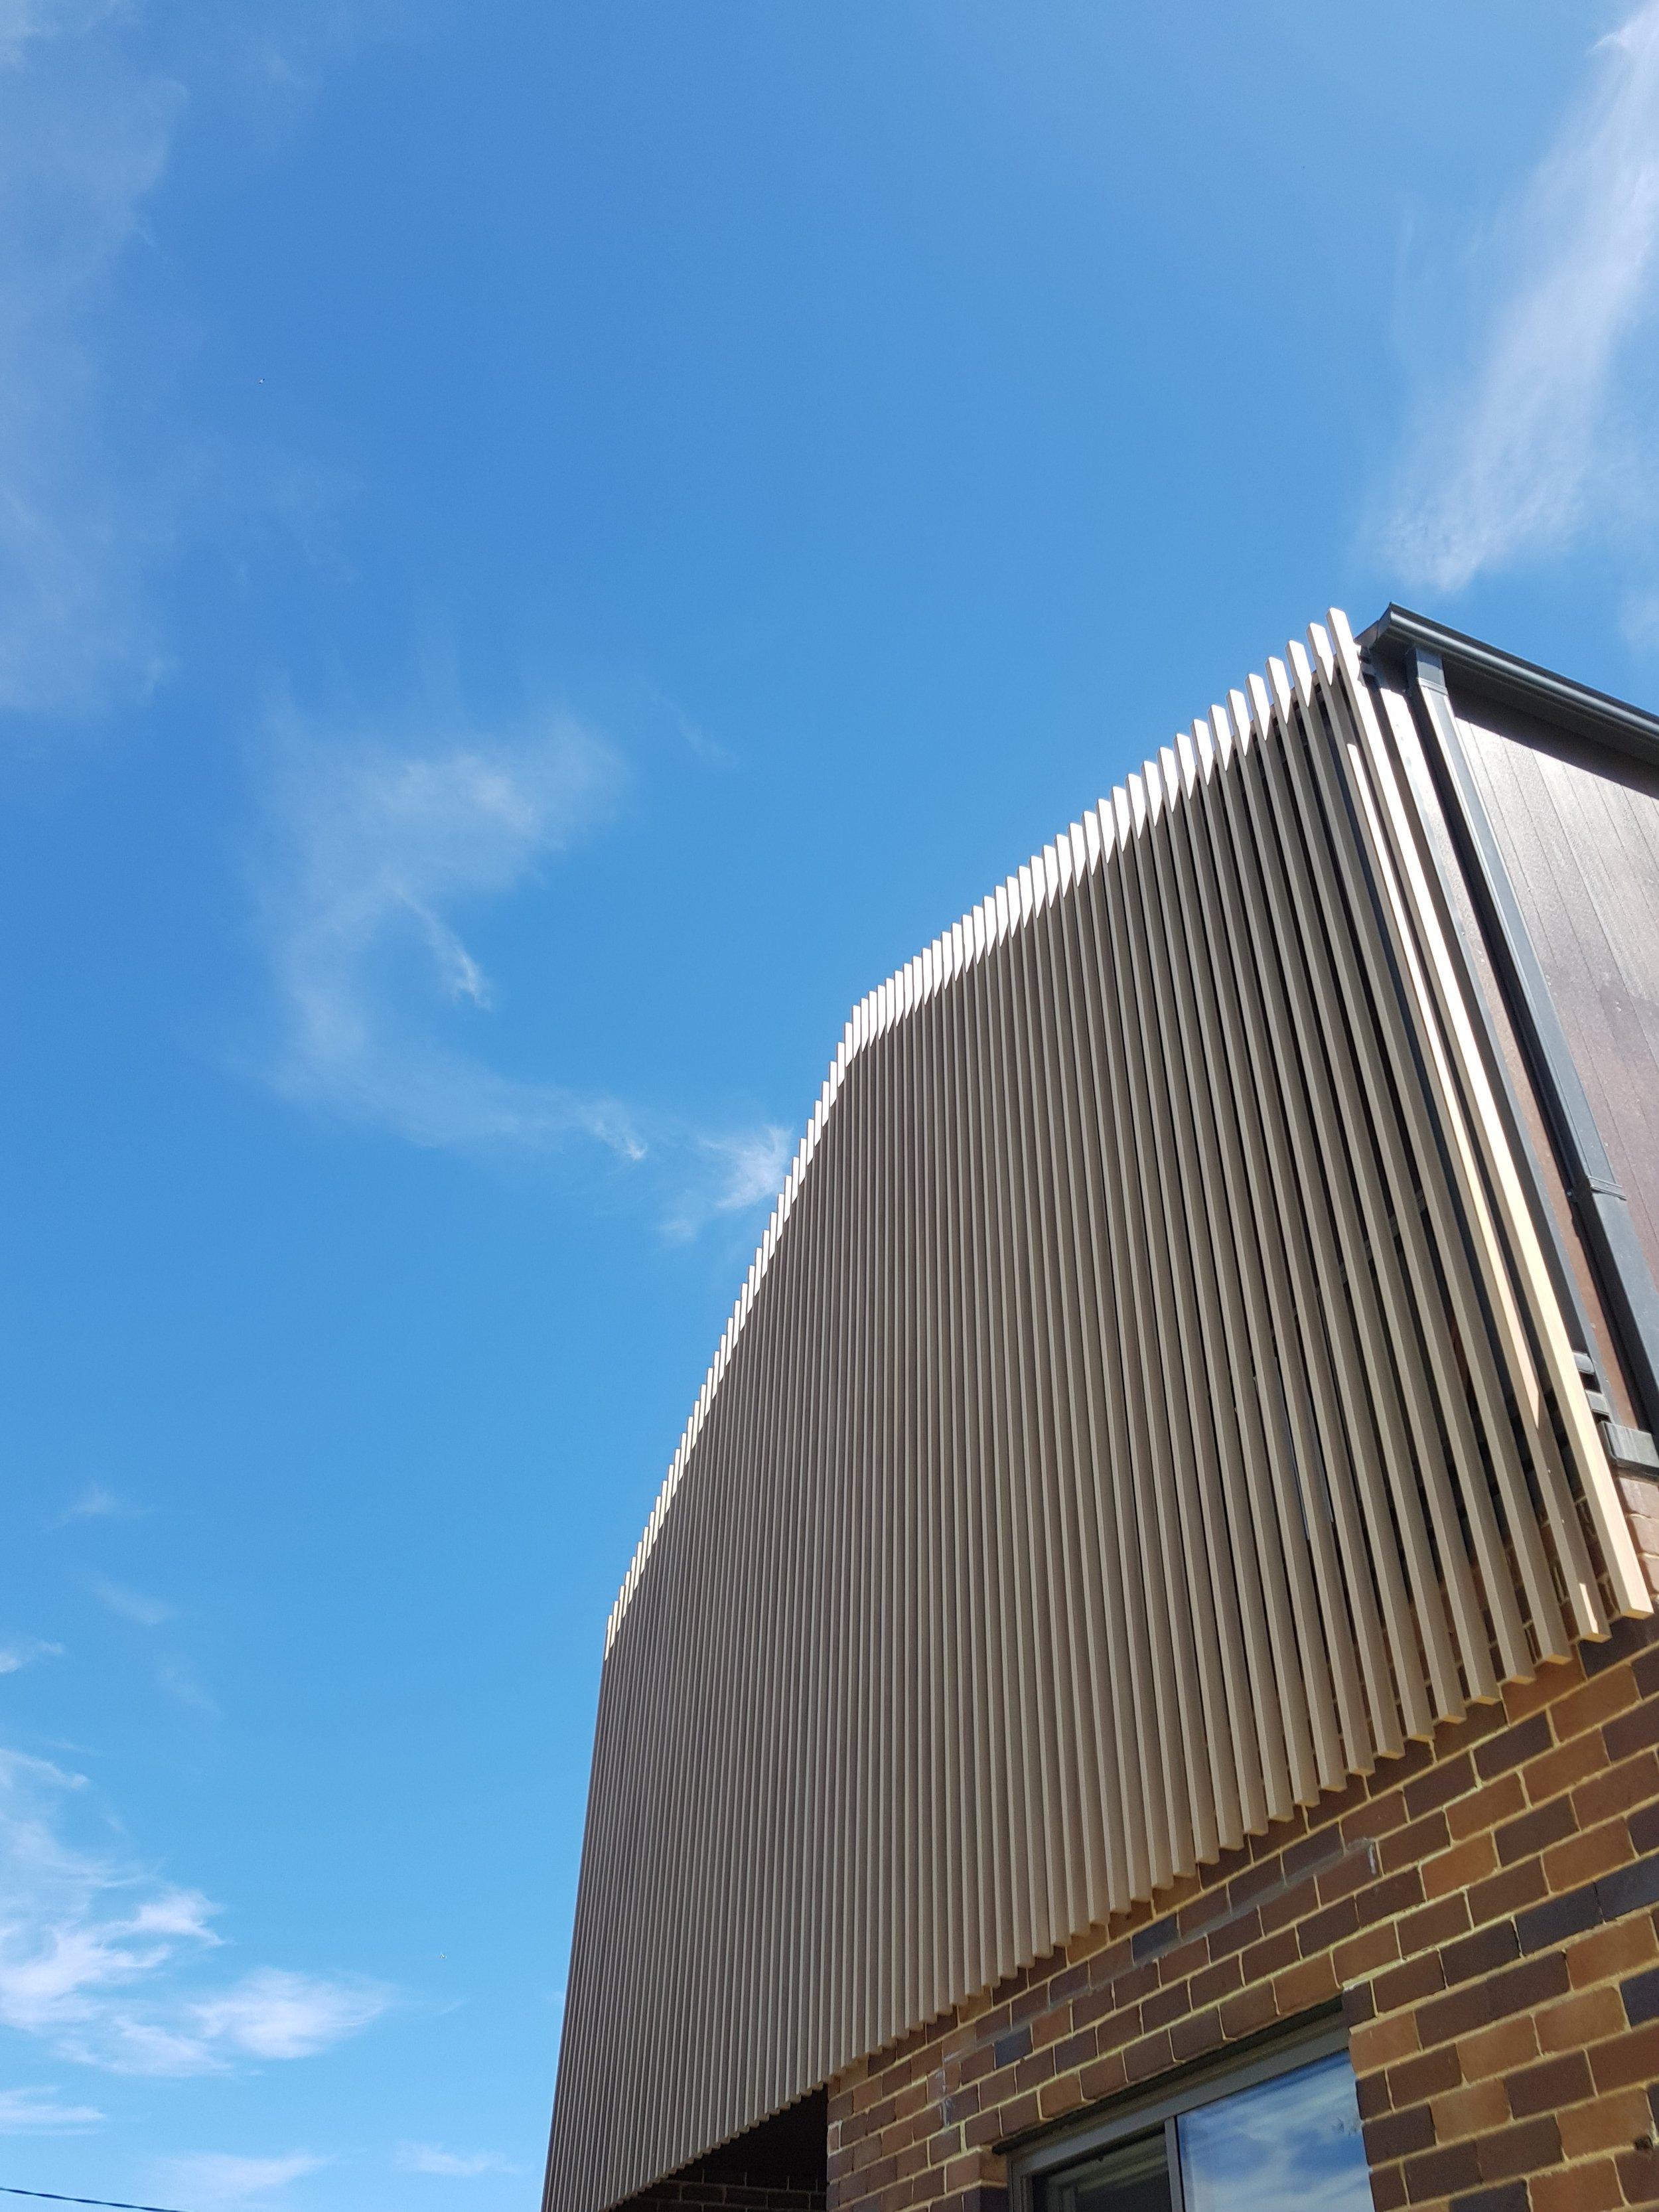 Architects' Private Residence - Sydney Ever Art Wood® battens - Kabebari 30x50 in Oku